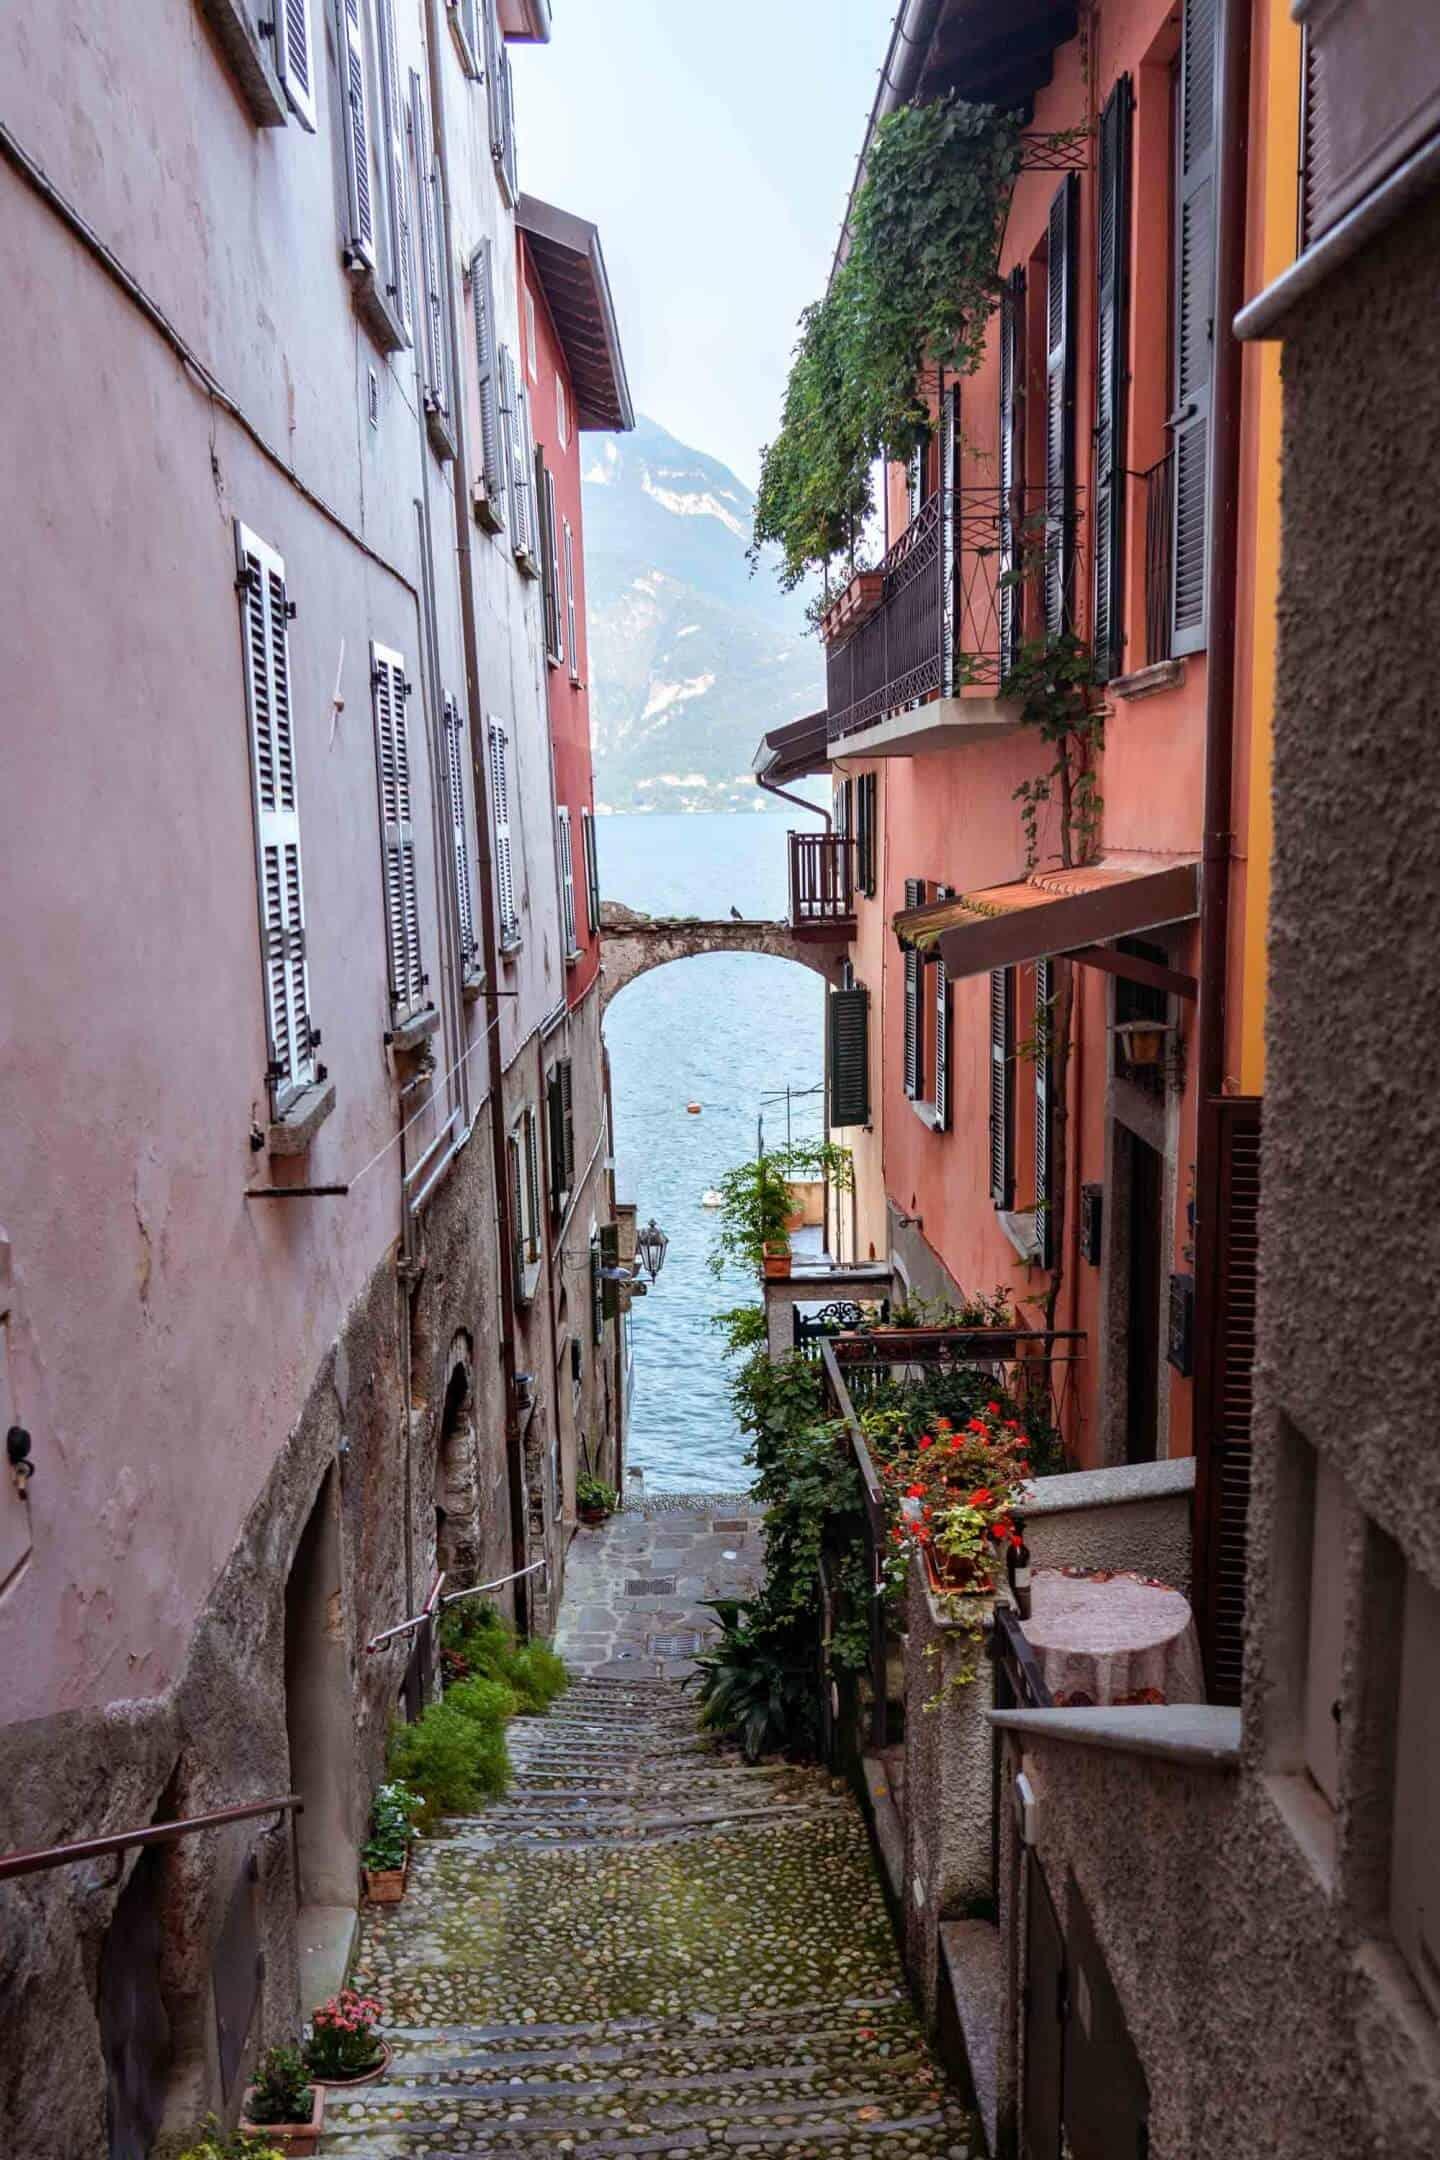 The steep narrow streets of Varenna, Lake Como